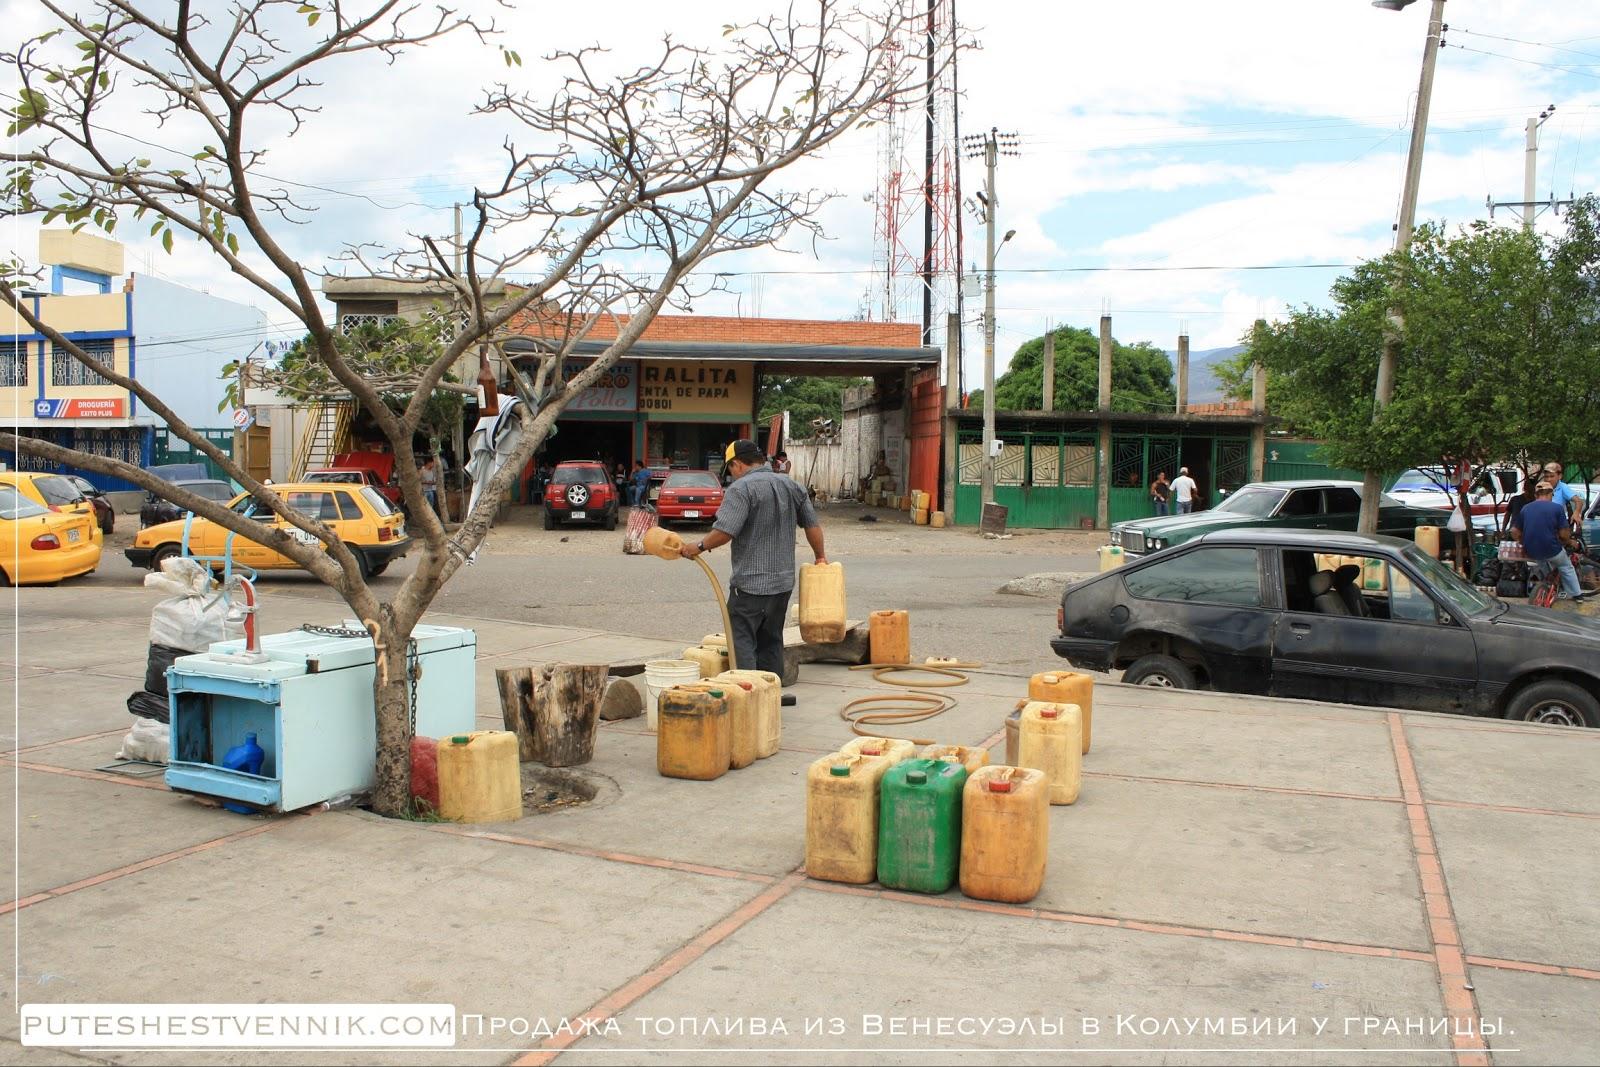 Продажа топлива на границе Венесуэлы и Колумбии